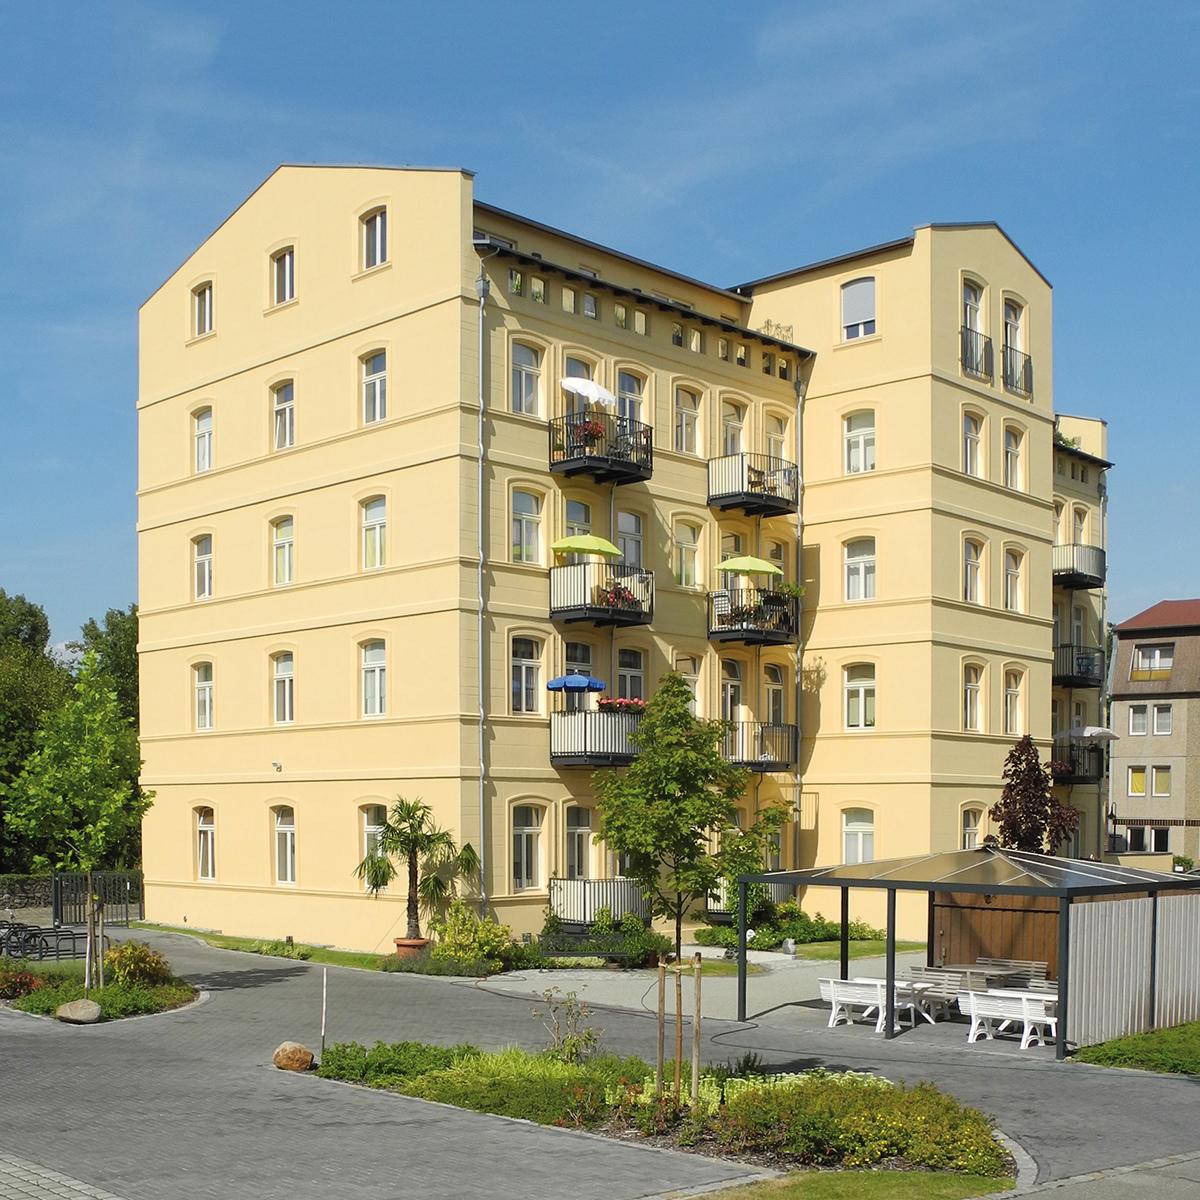 Münzstraße 10, 03044 Cottbus